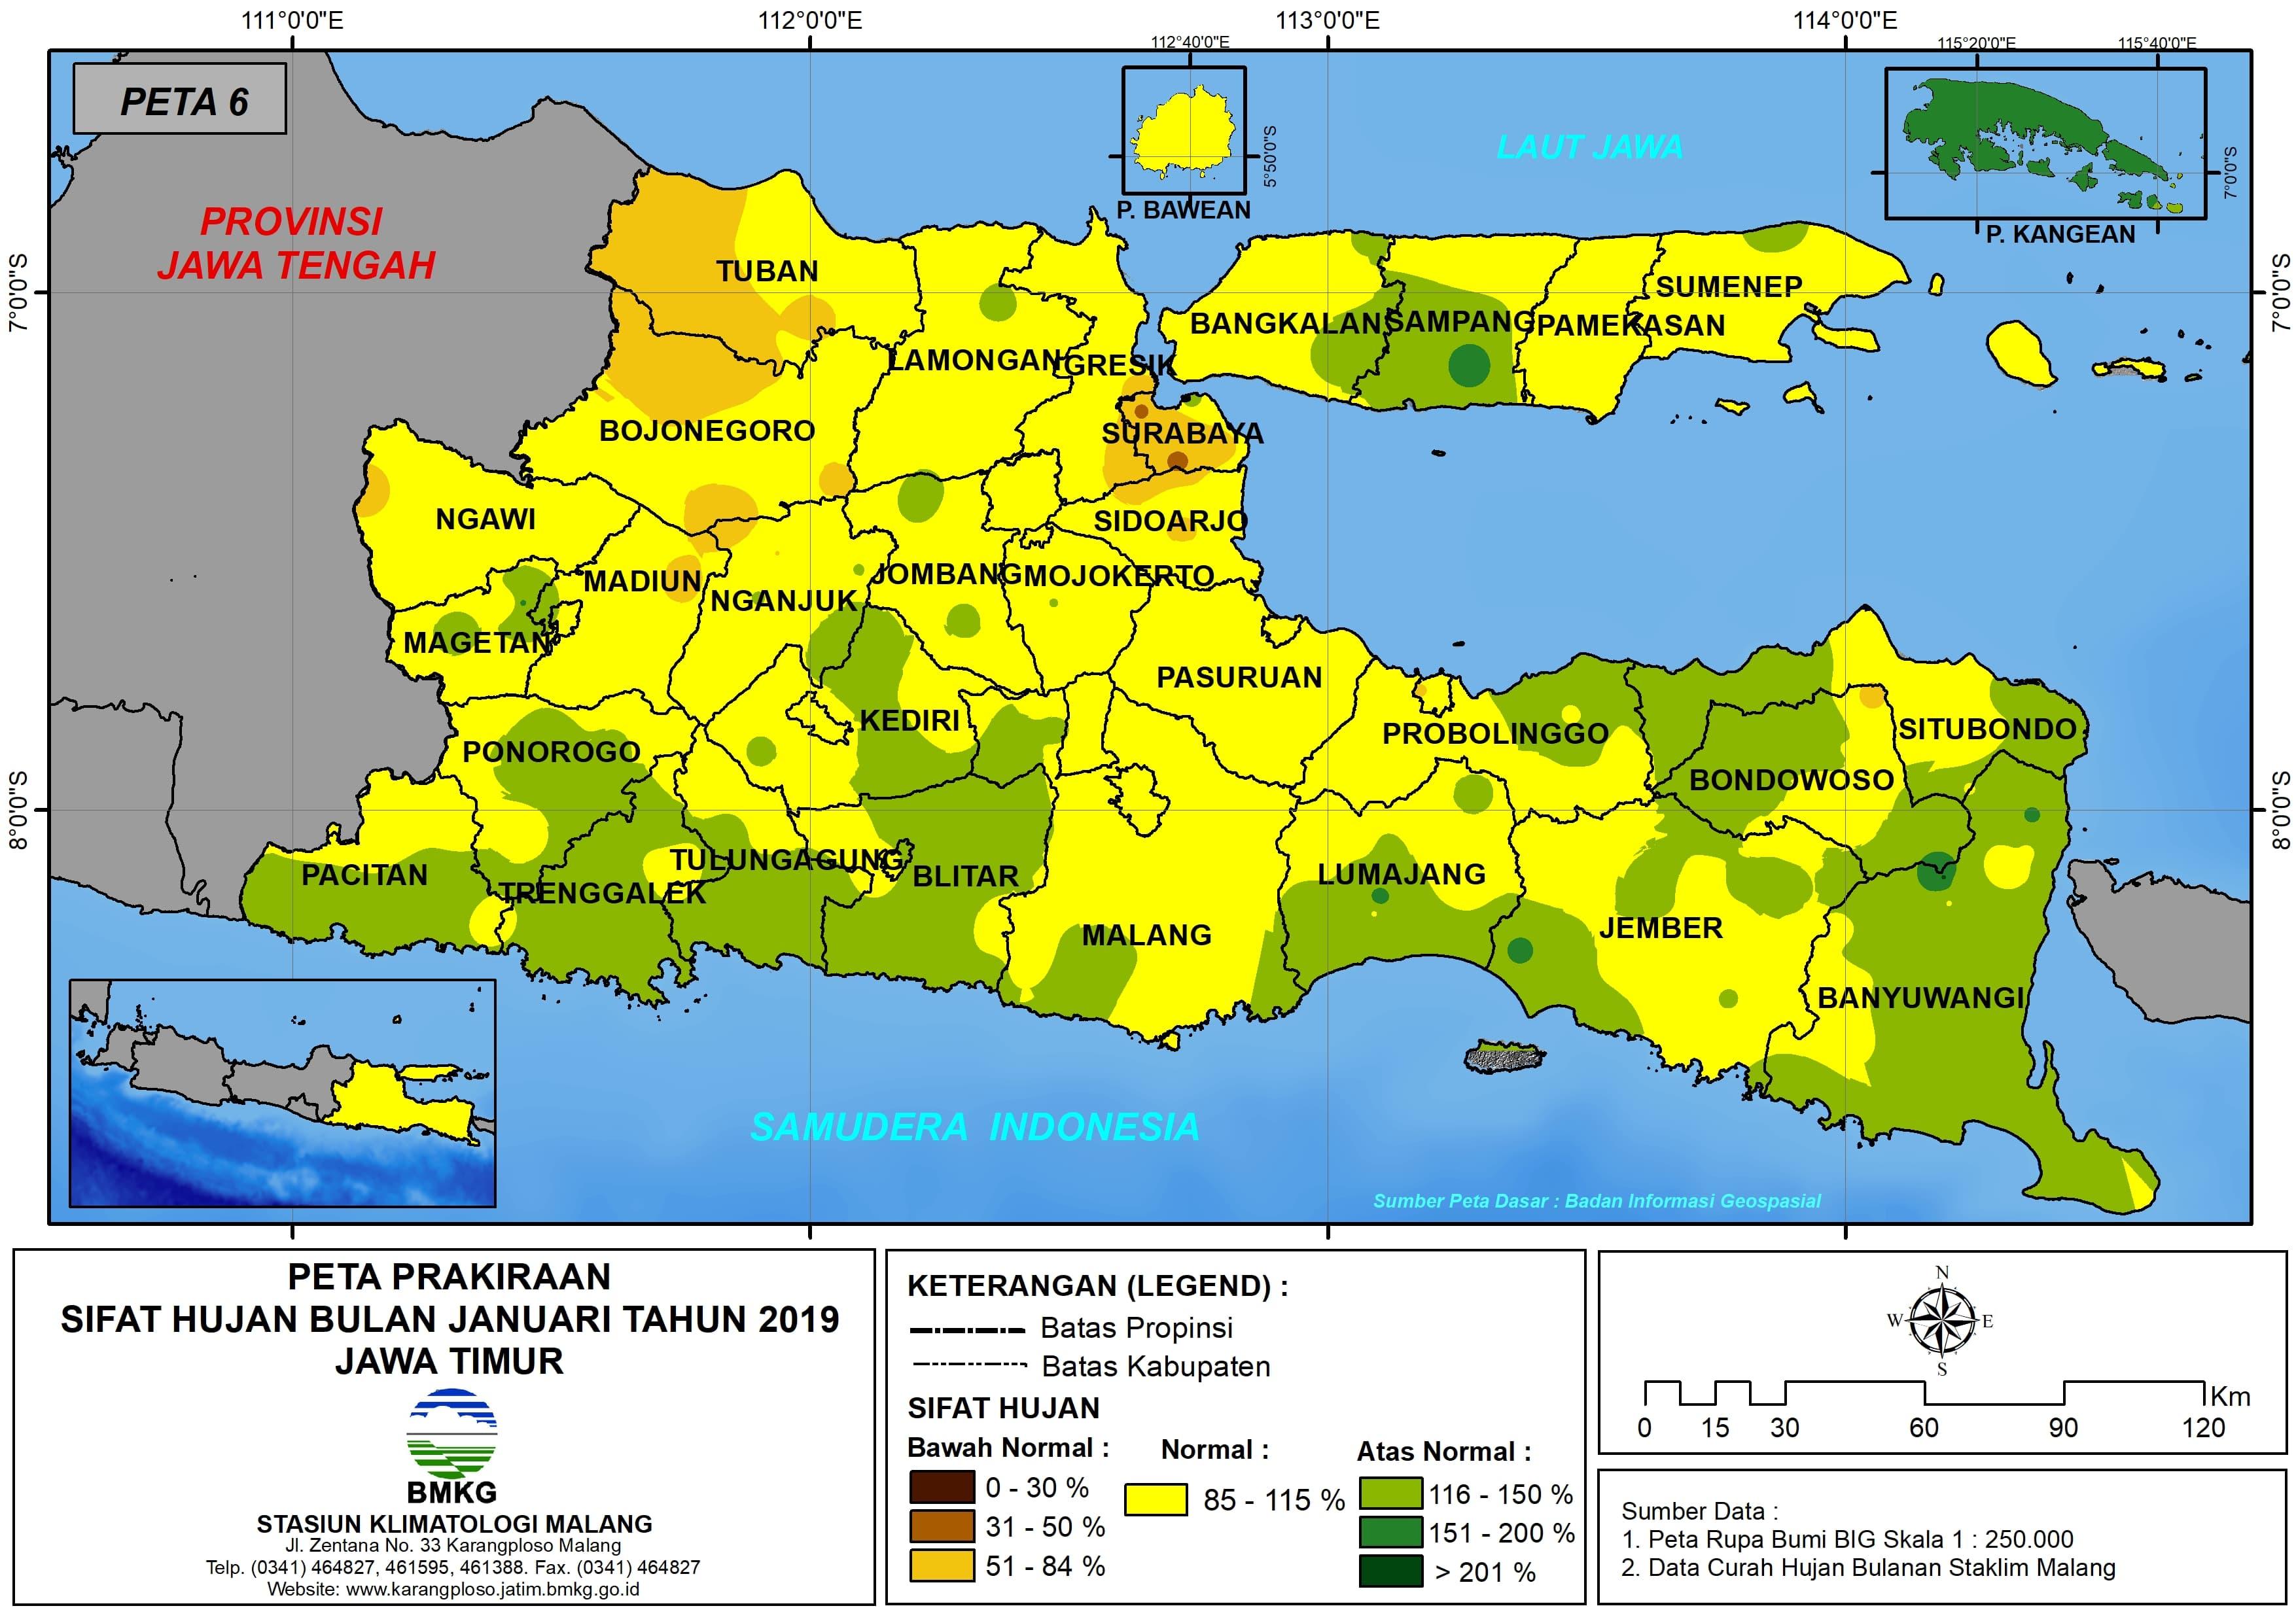 Prakiraan Sifat Hujan Bulan Januari Tahun 2018 di Provinsi Jawa Timur Update dari Analisis Bulan Oktober 2018